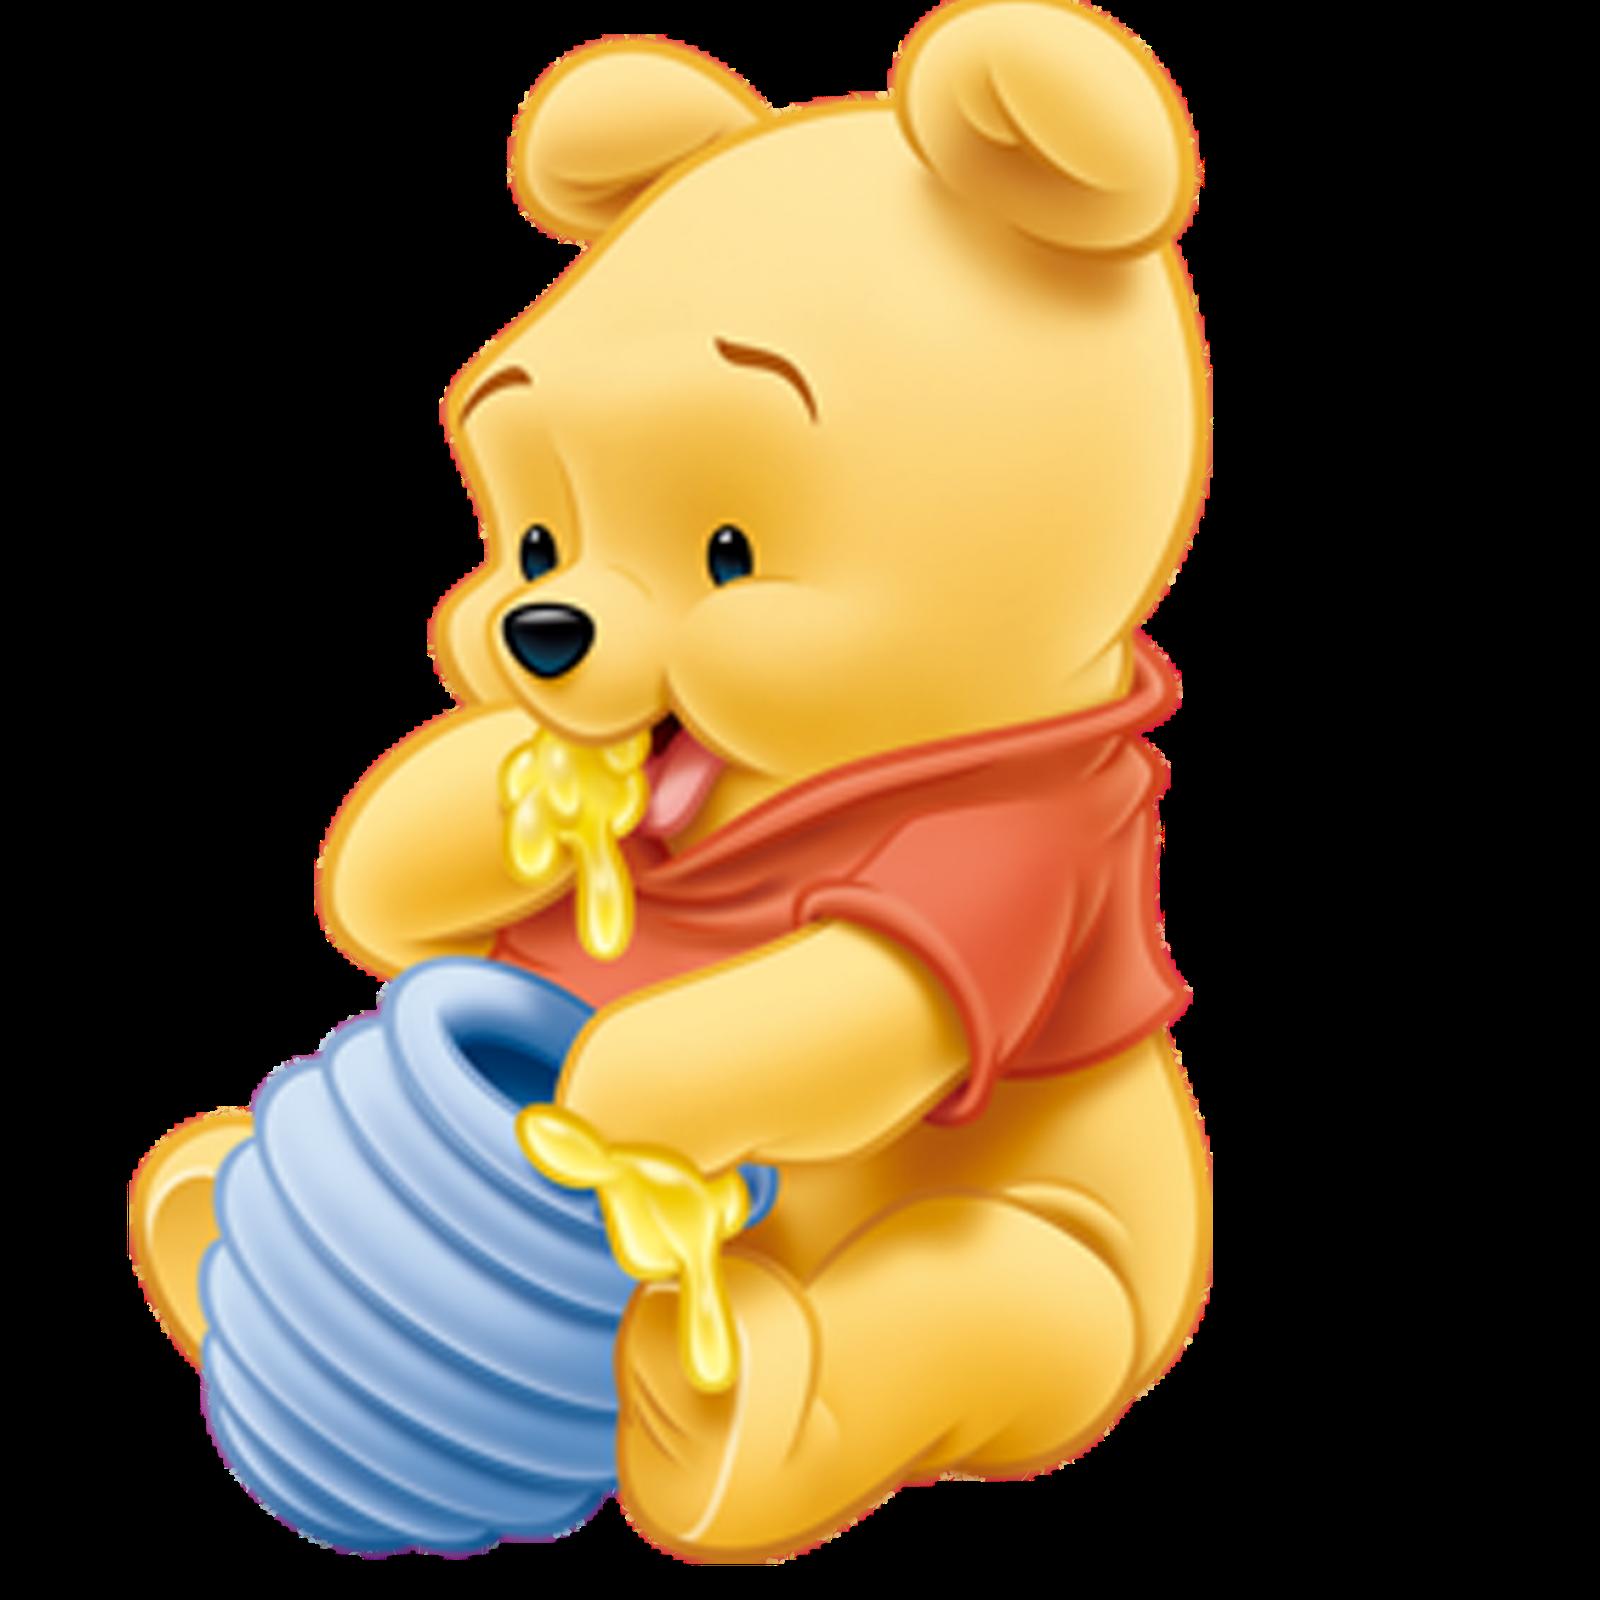 winni pooh